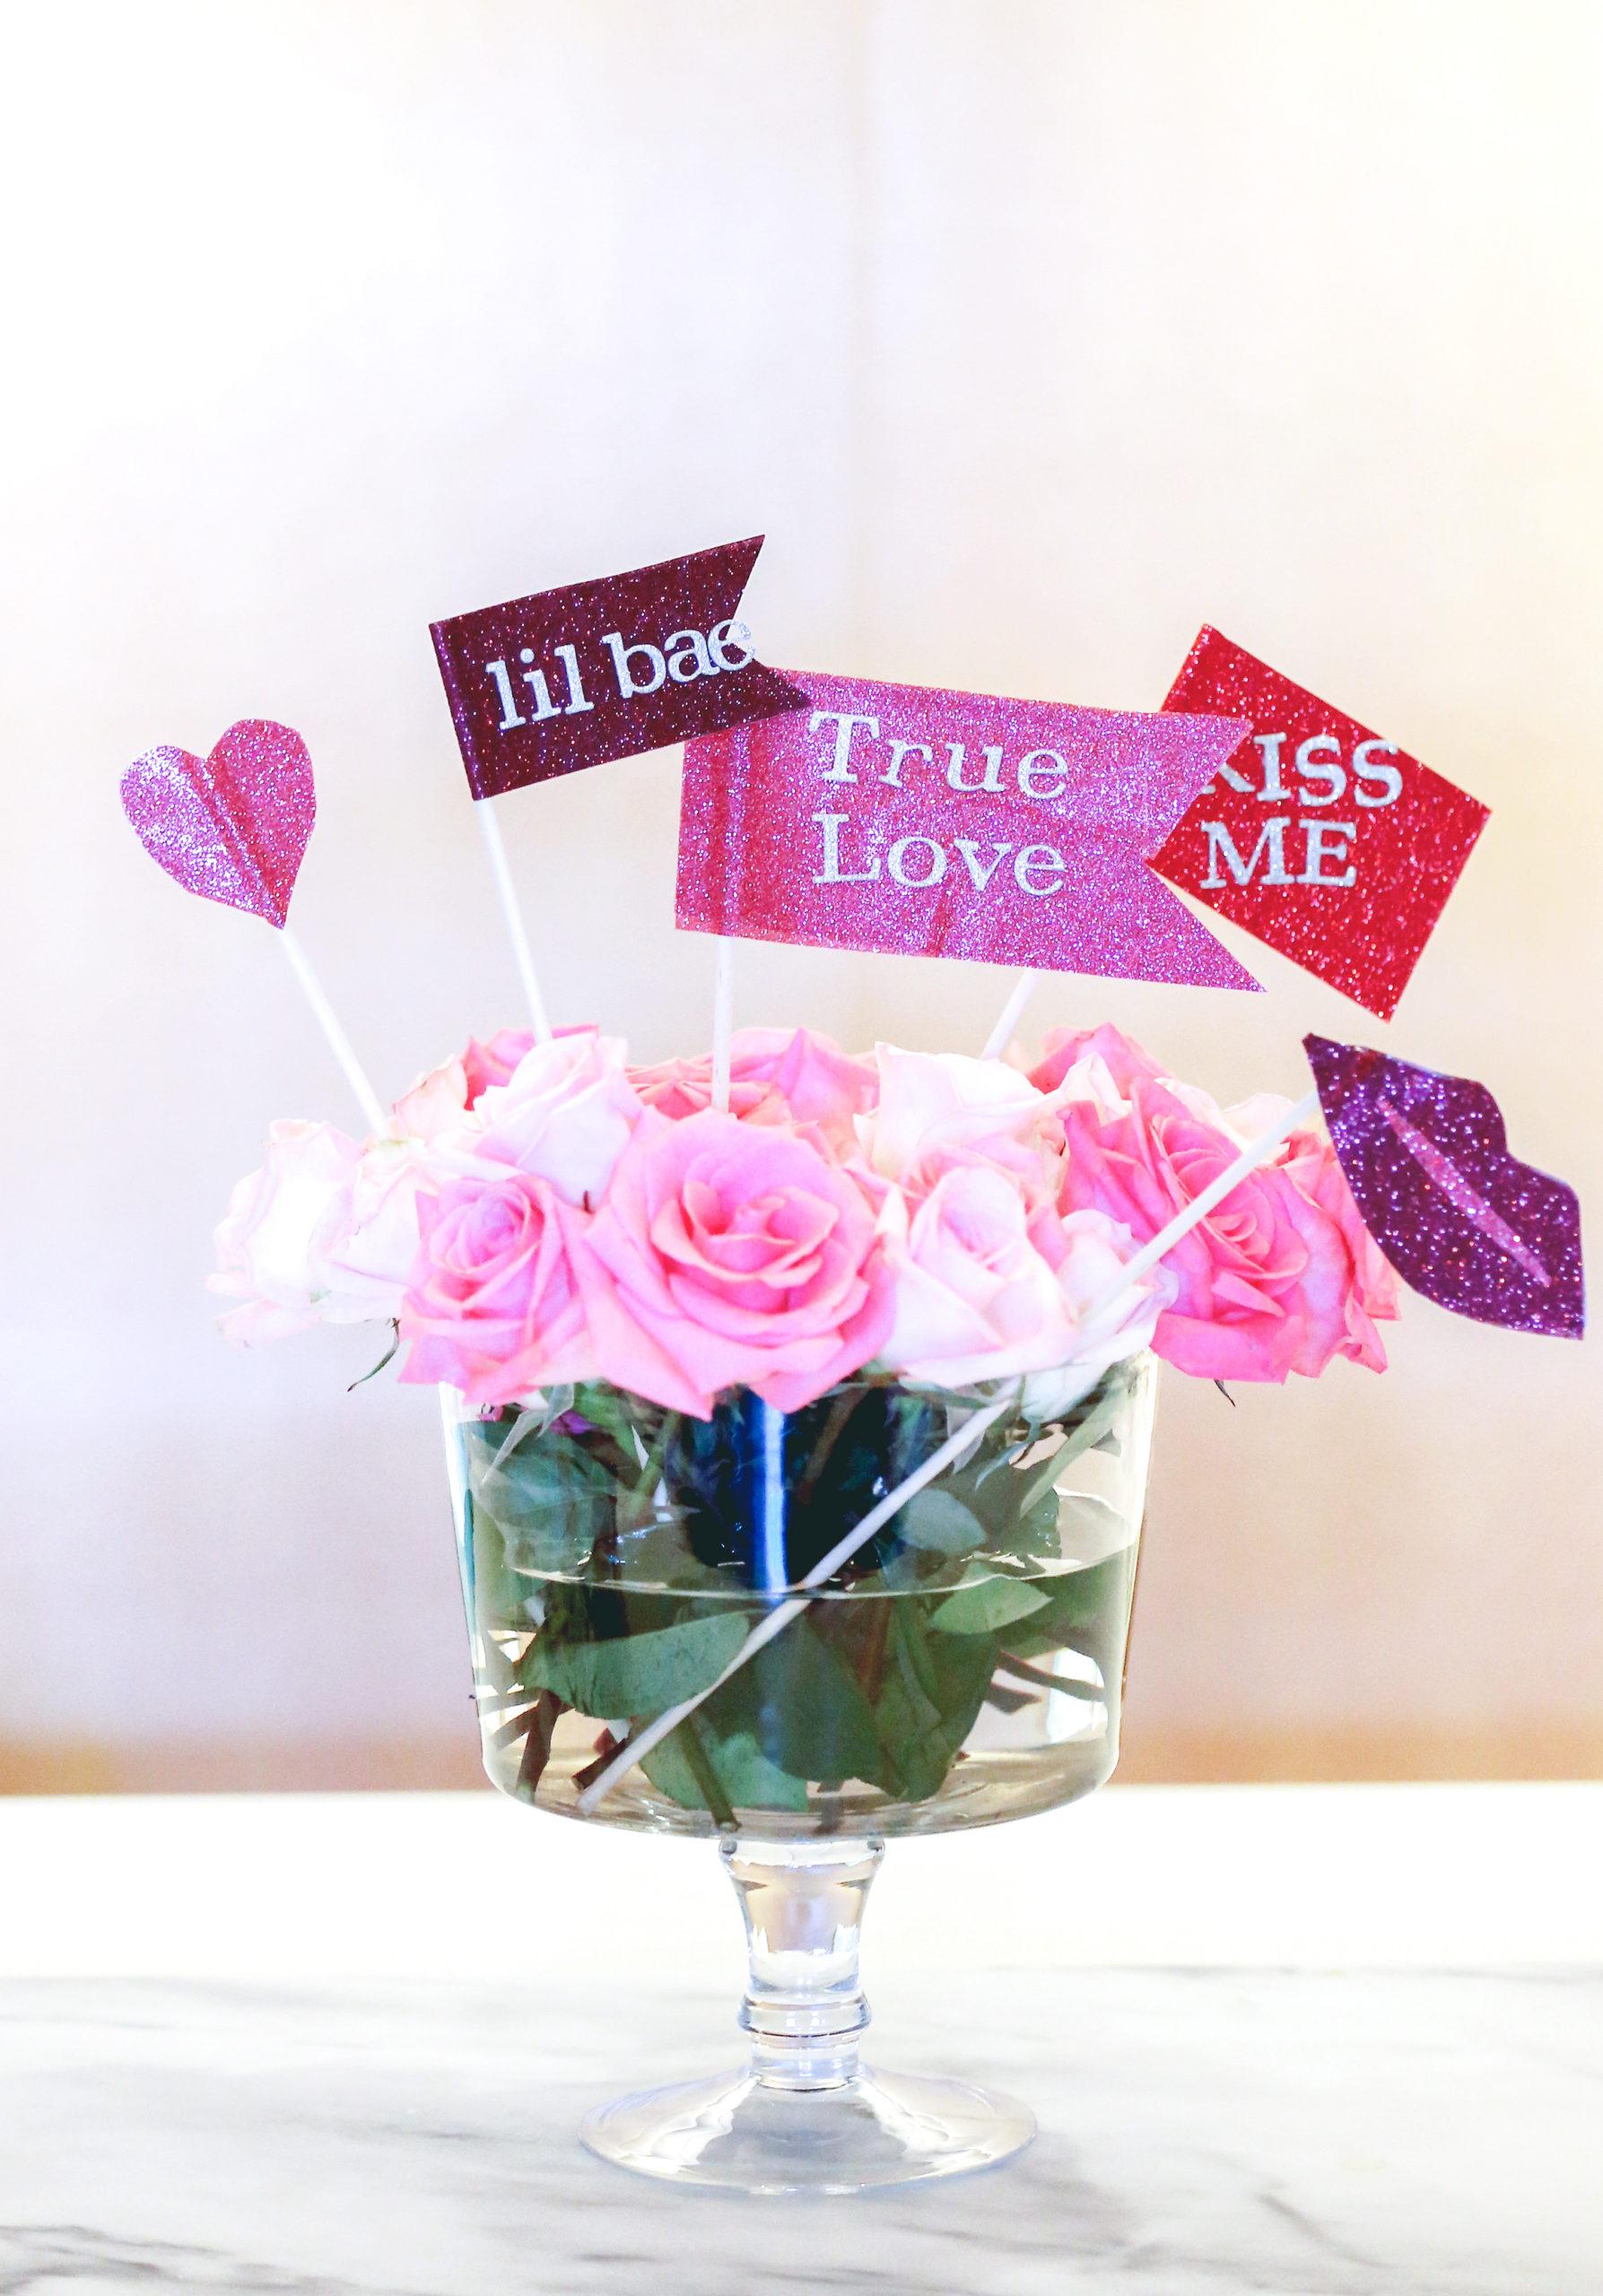 Eva Amurri shares how to make cute DIY Valentine's Day Photo Props